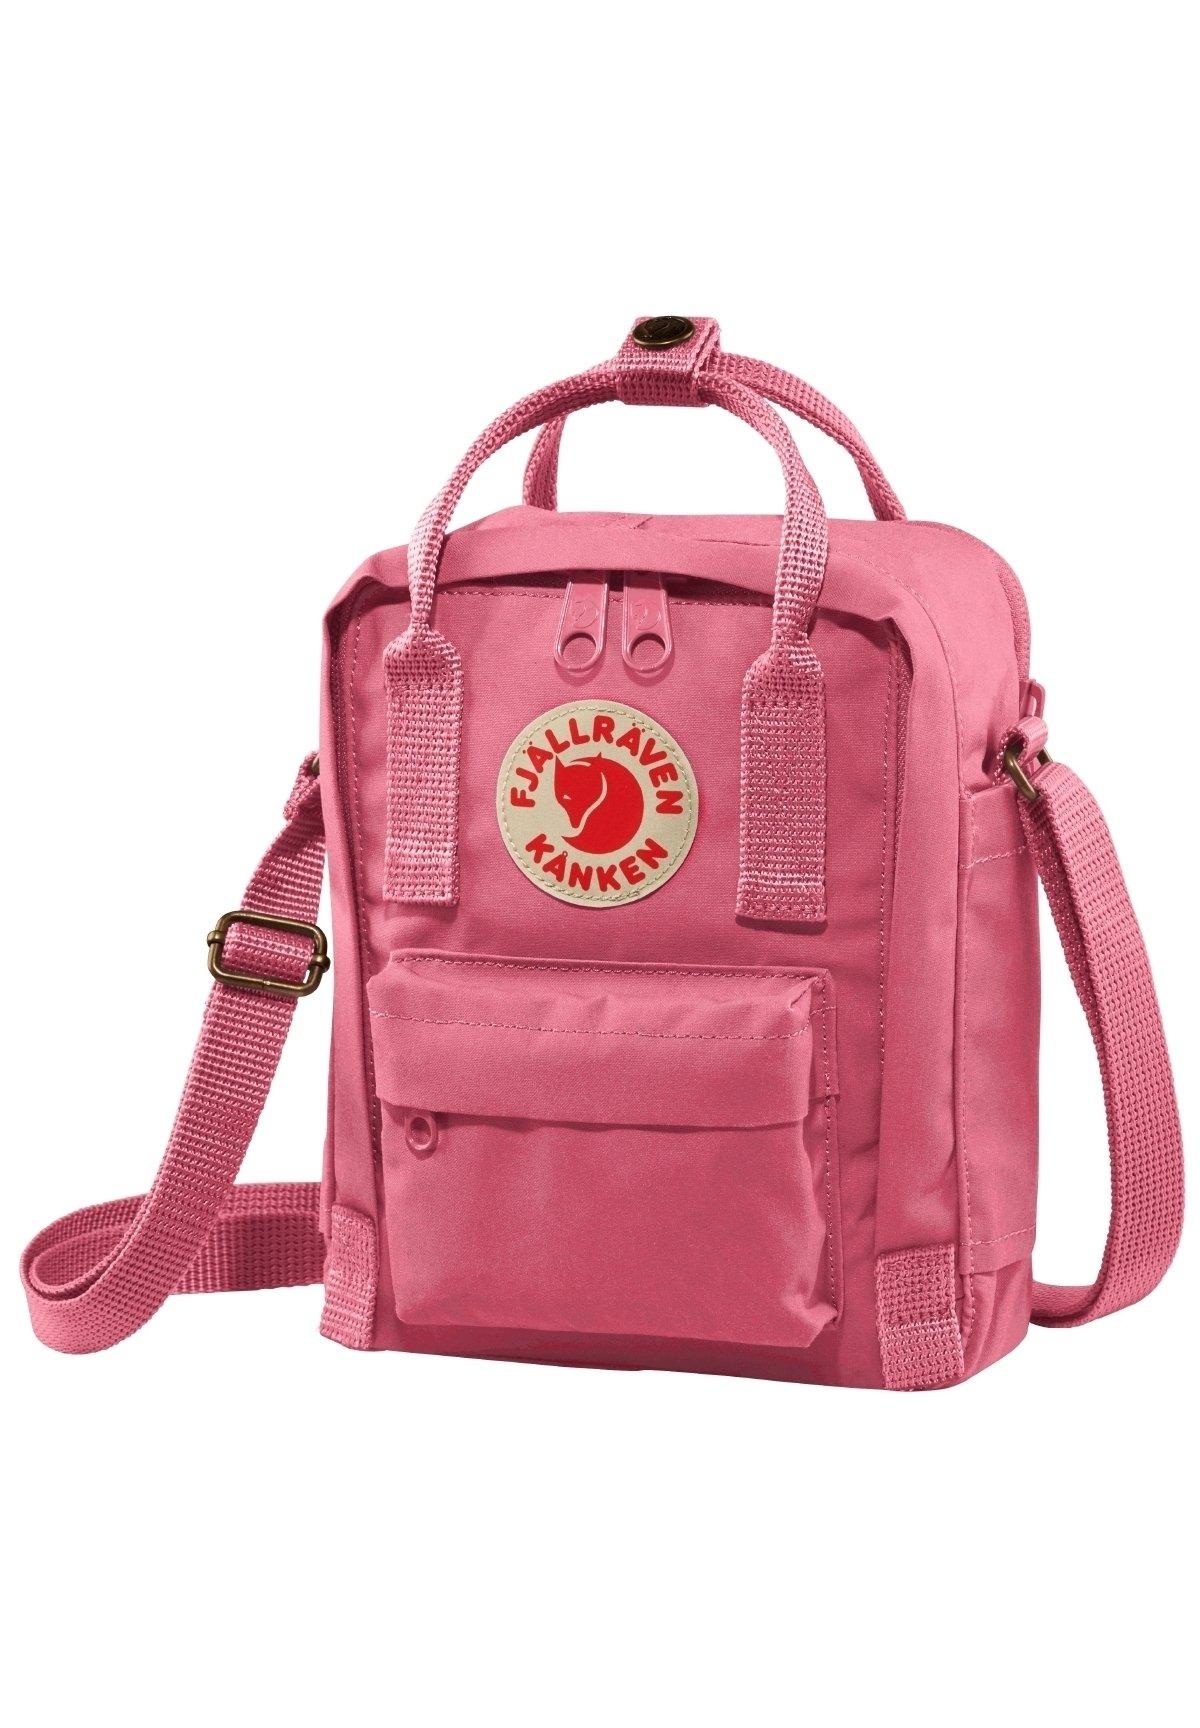 Uomo KANKEN SLING - Borsa a tracolla - flamingo pink